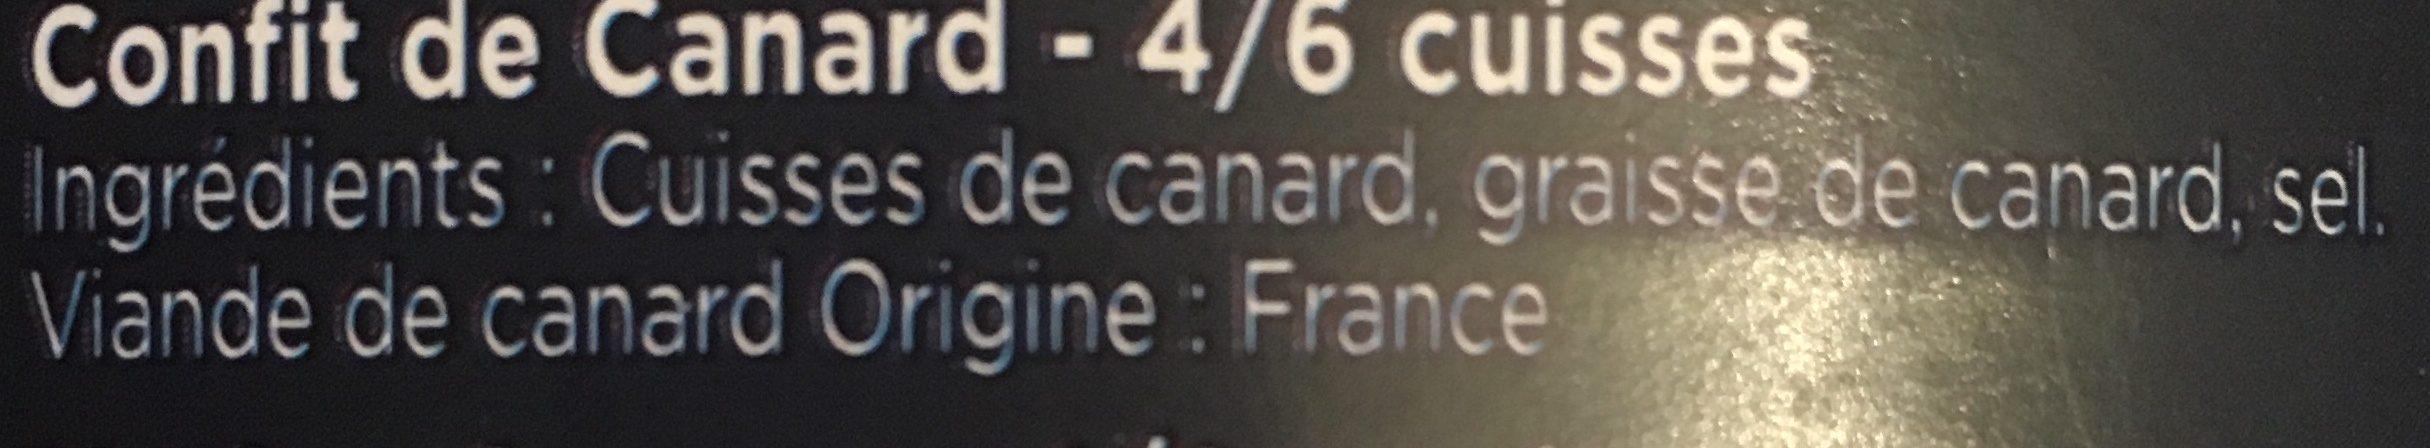 Confit de canard - Ingrediënten